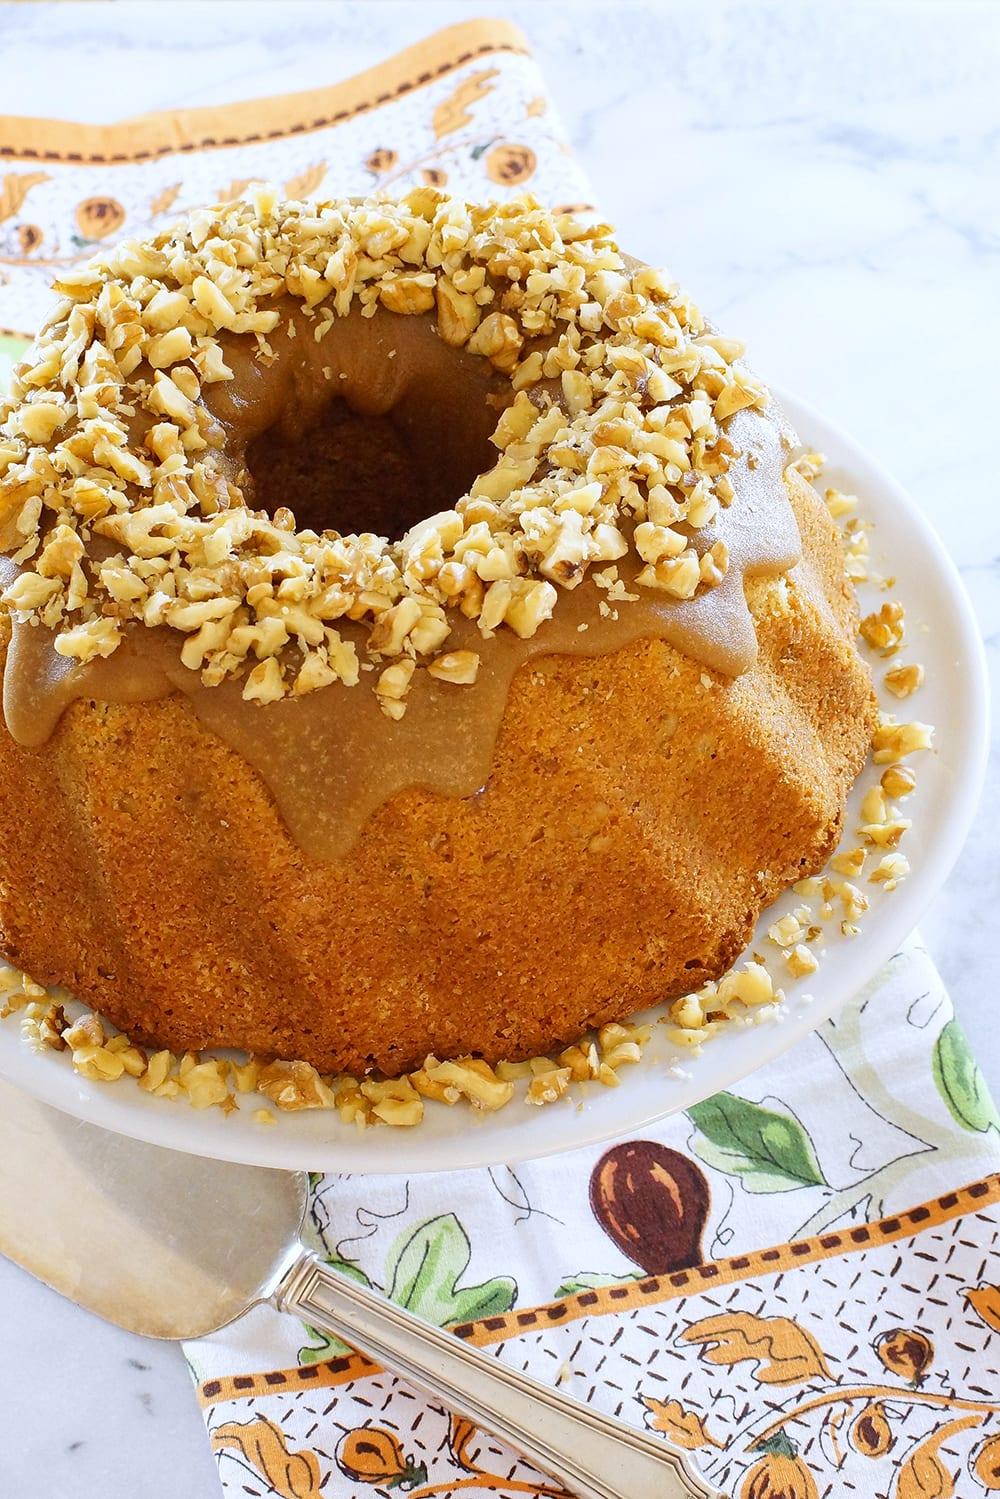 Pound Cake with Walnuts and Brown Sugar Glaze